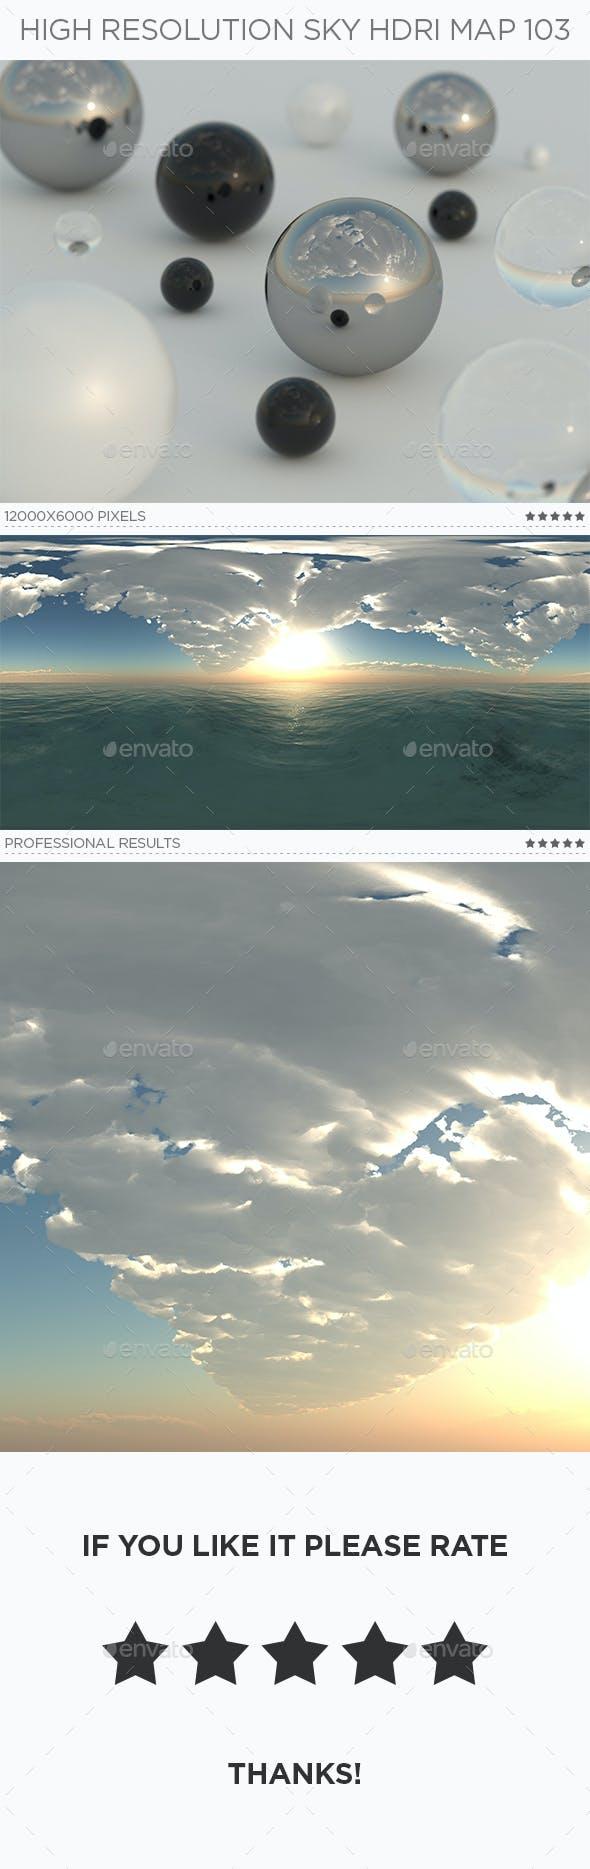 High Resolution Sky HDRi Map 103 - 3DOcean Item for Sale